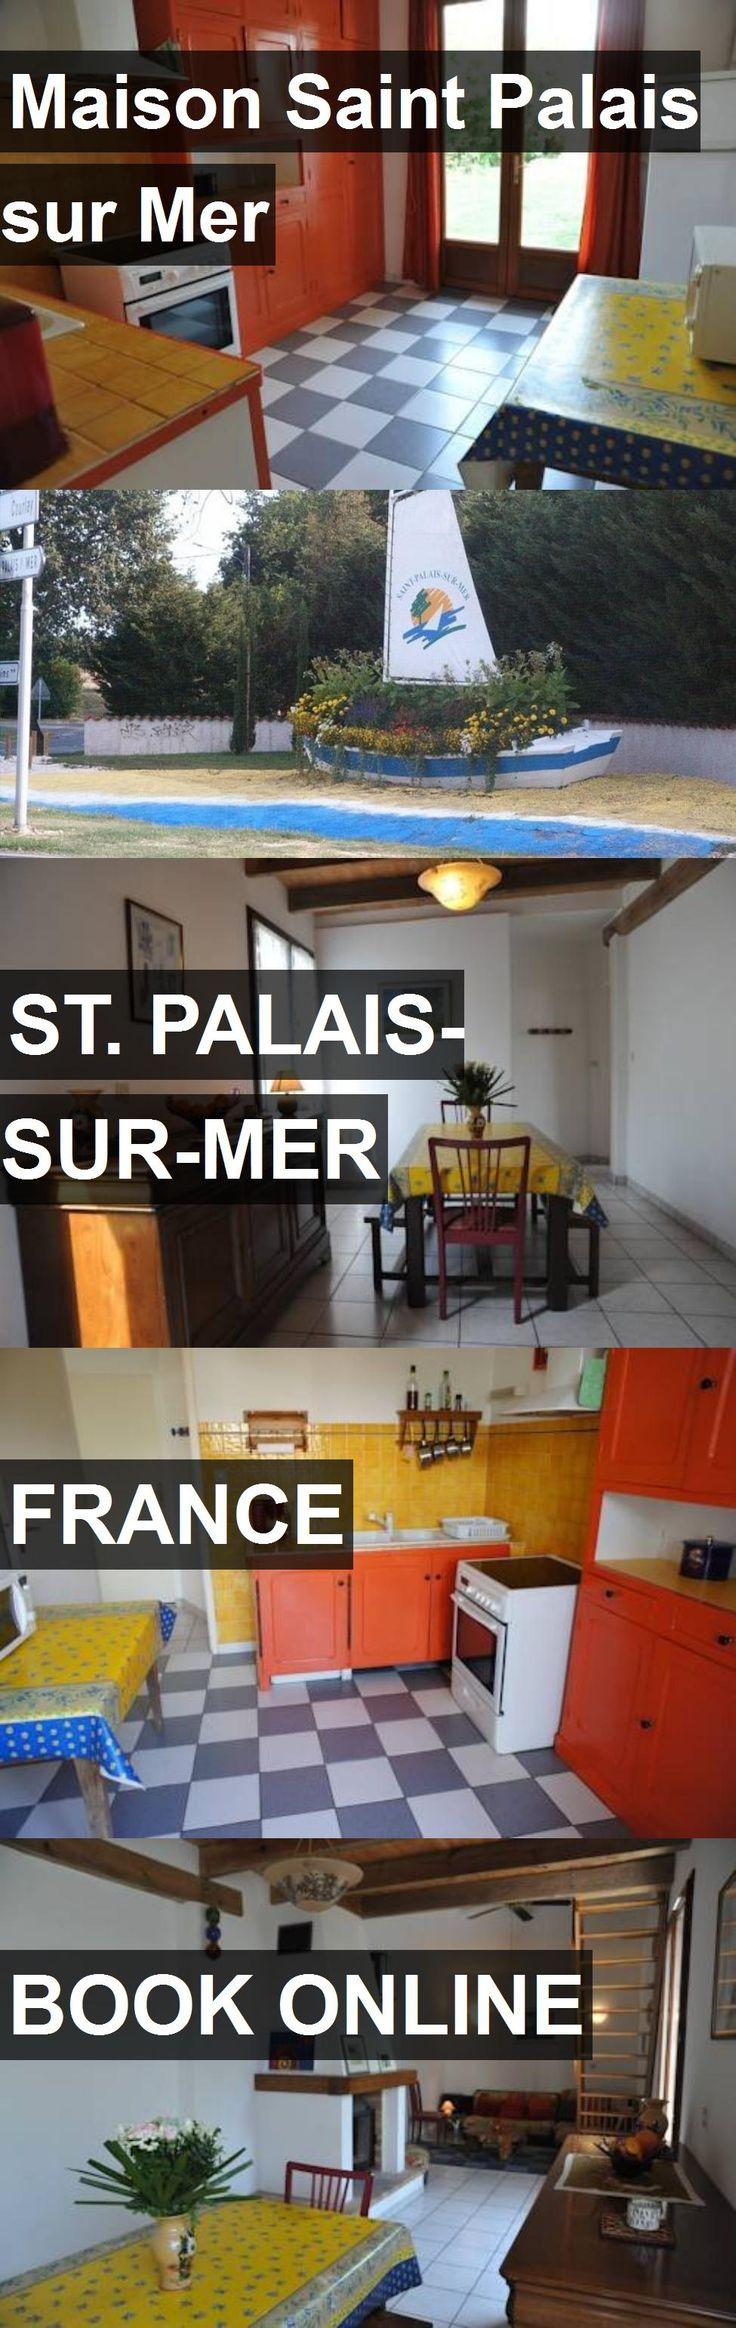 Hotel Maison Saint Palais sur Mer in St. Palais-sur-Mer, France. For more information, photos, reviews and best prices please follow the link. #France #St.Palais-sur-Mer #travel #vacation #hotel